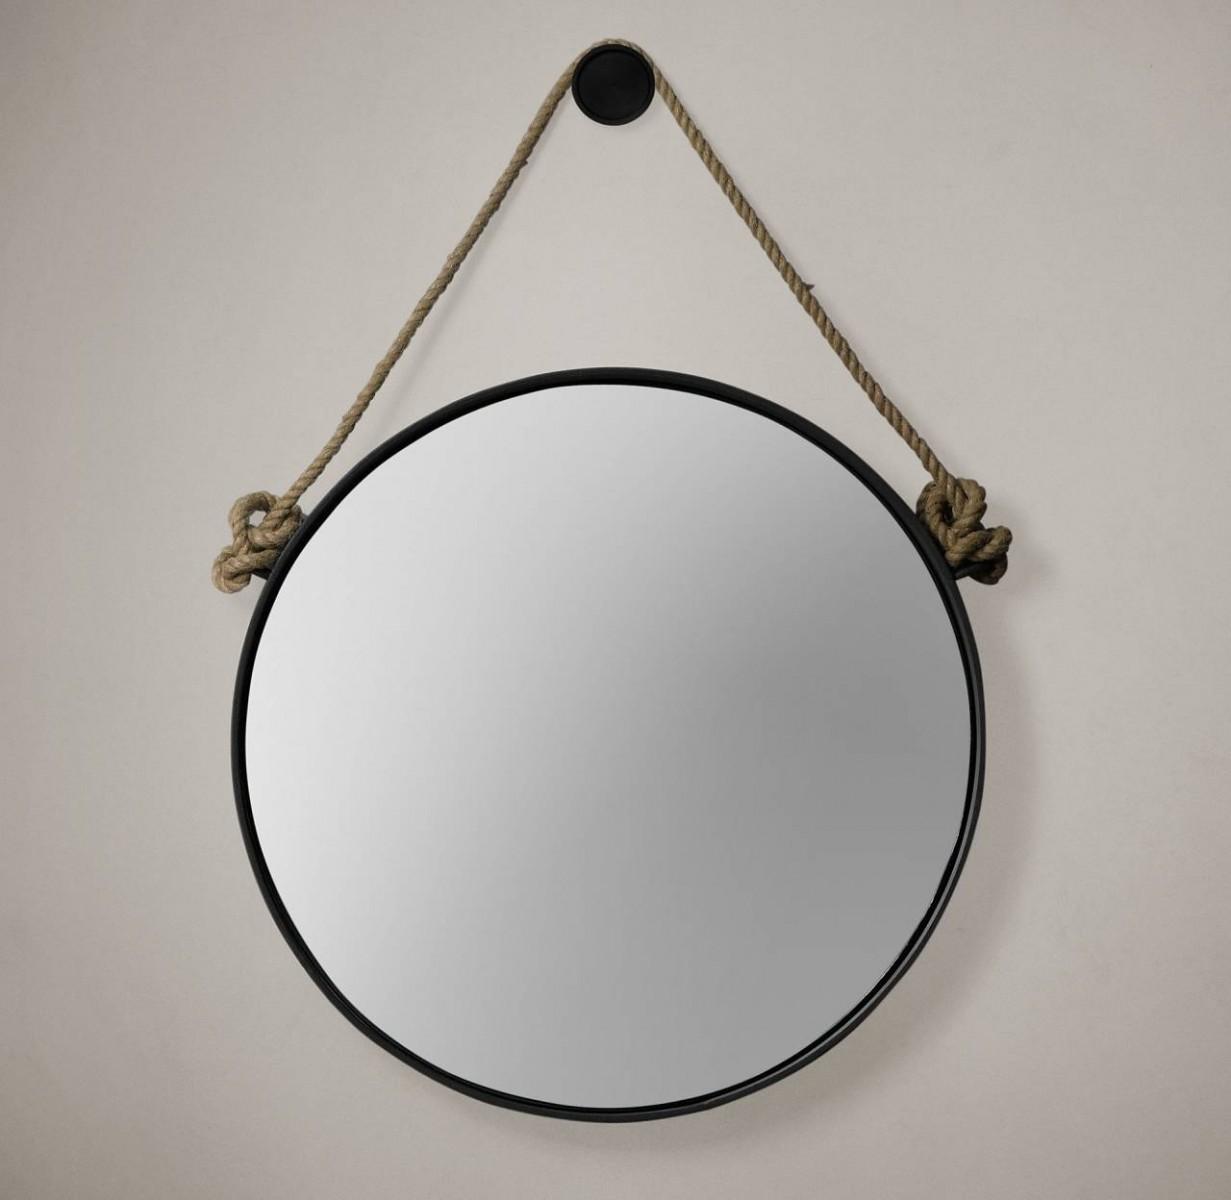 зеркало на шнуре фото